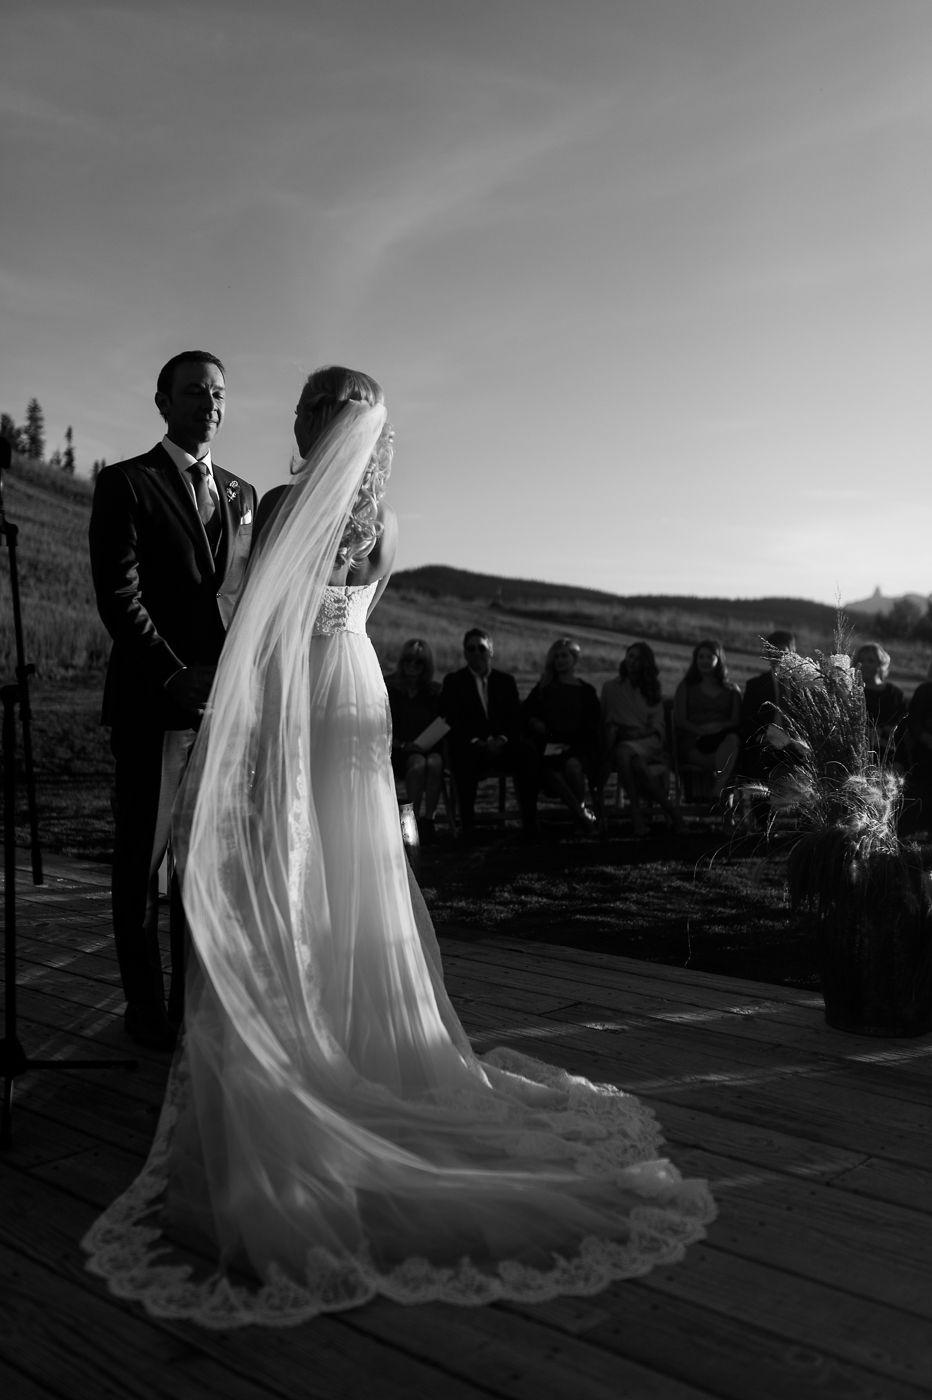 Brooke Werner Chad Knaus Chowen Photography Wedding Engagement Photos Telluride Wedding Chad Knaus